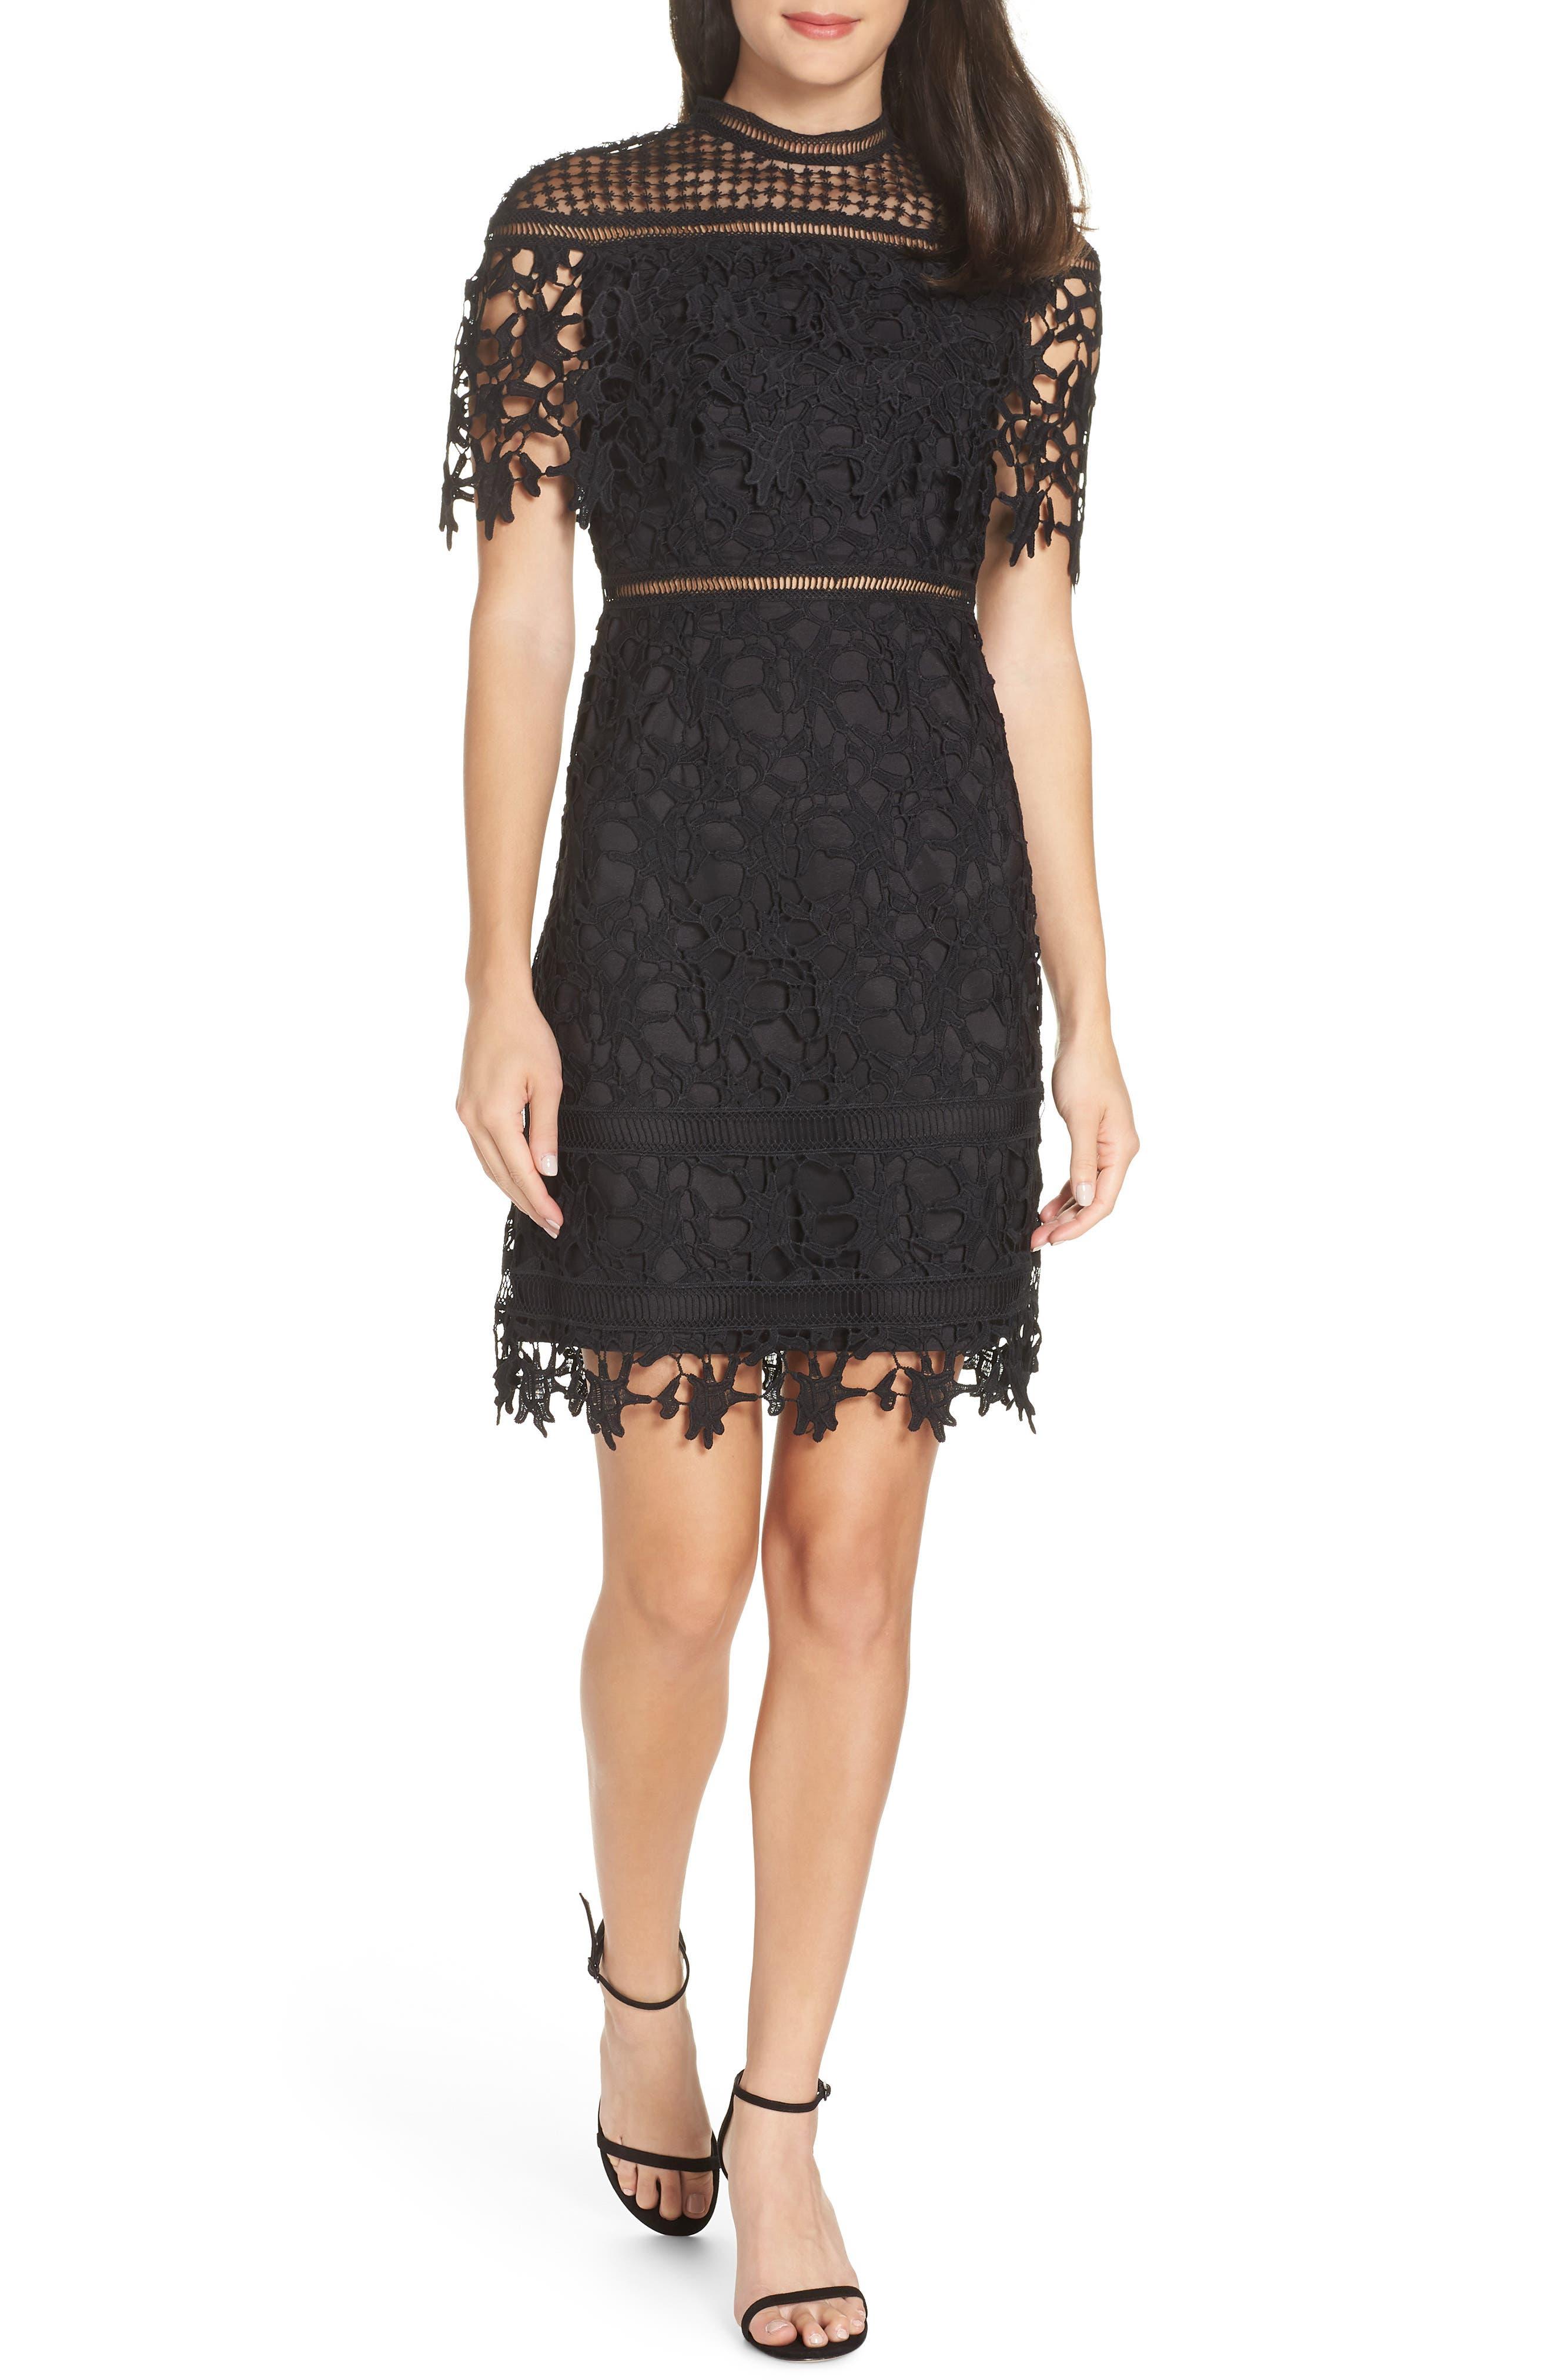 Chi Chi London Adita Crochet Lace Cocktail Dress, Black